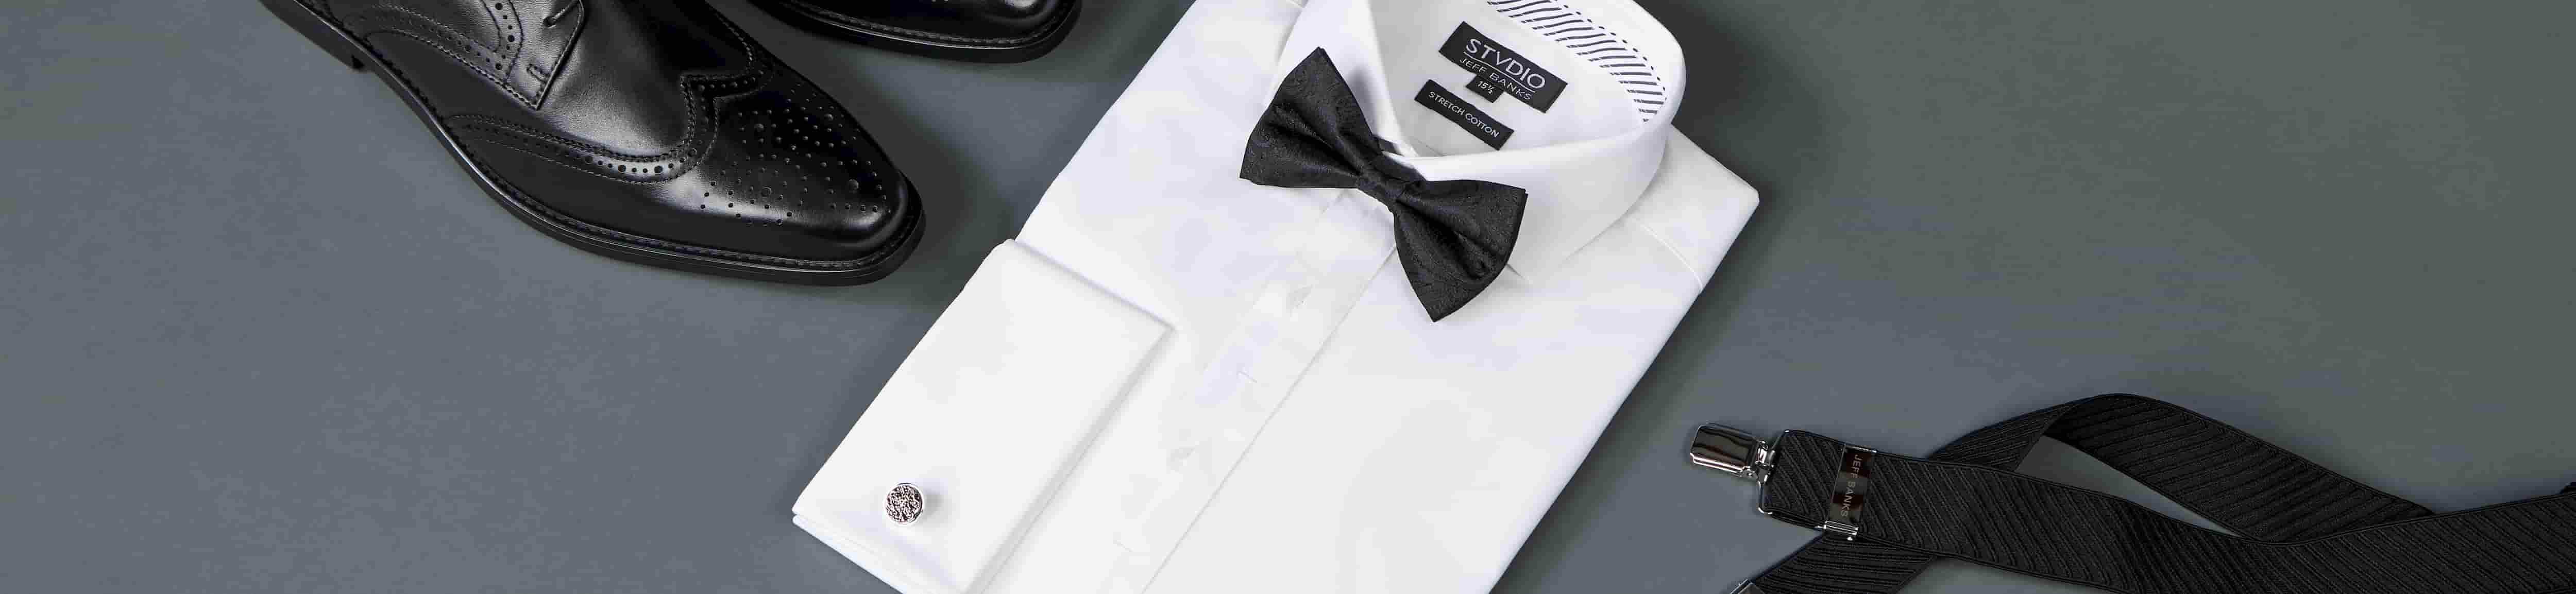 Men's Dresswear Accessories